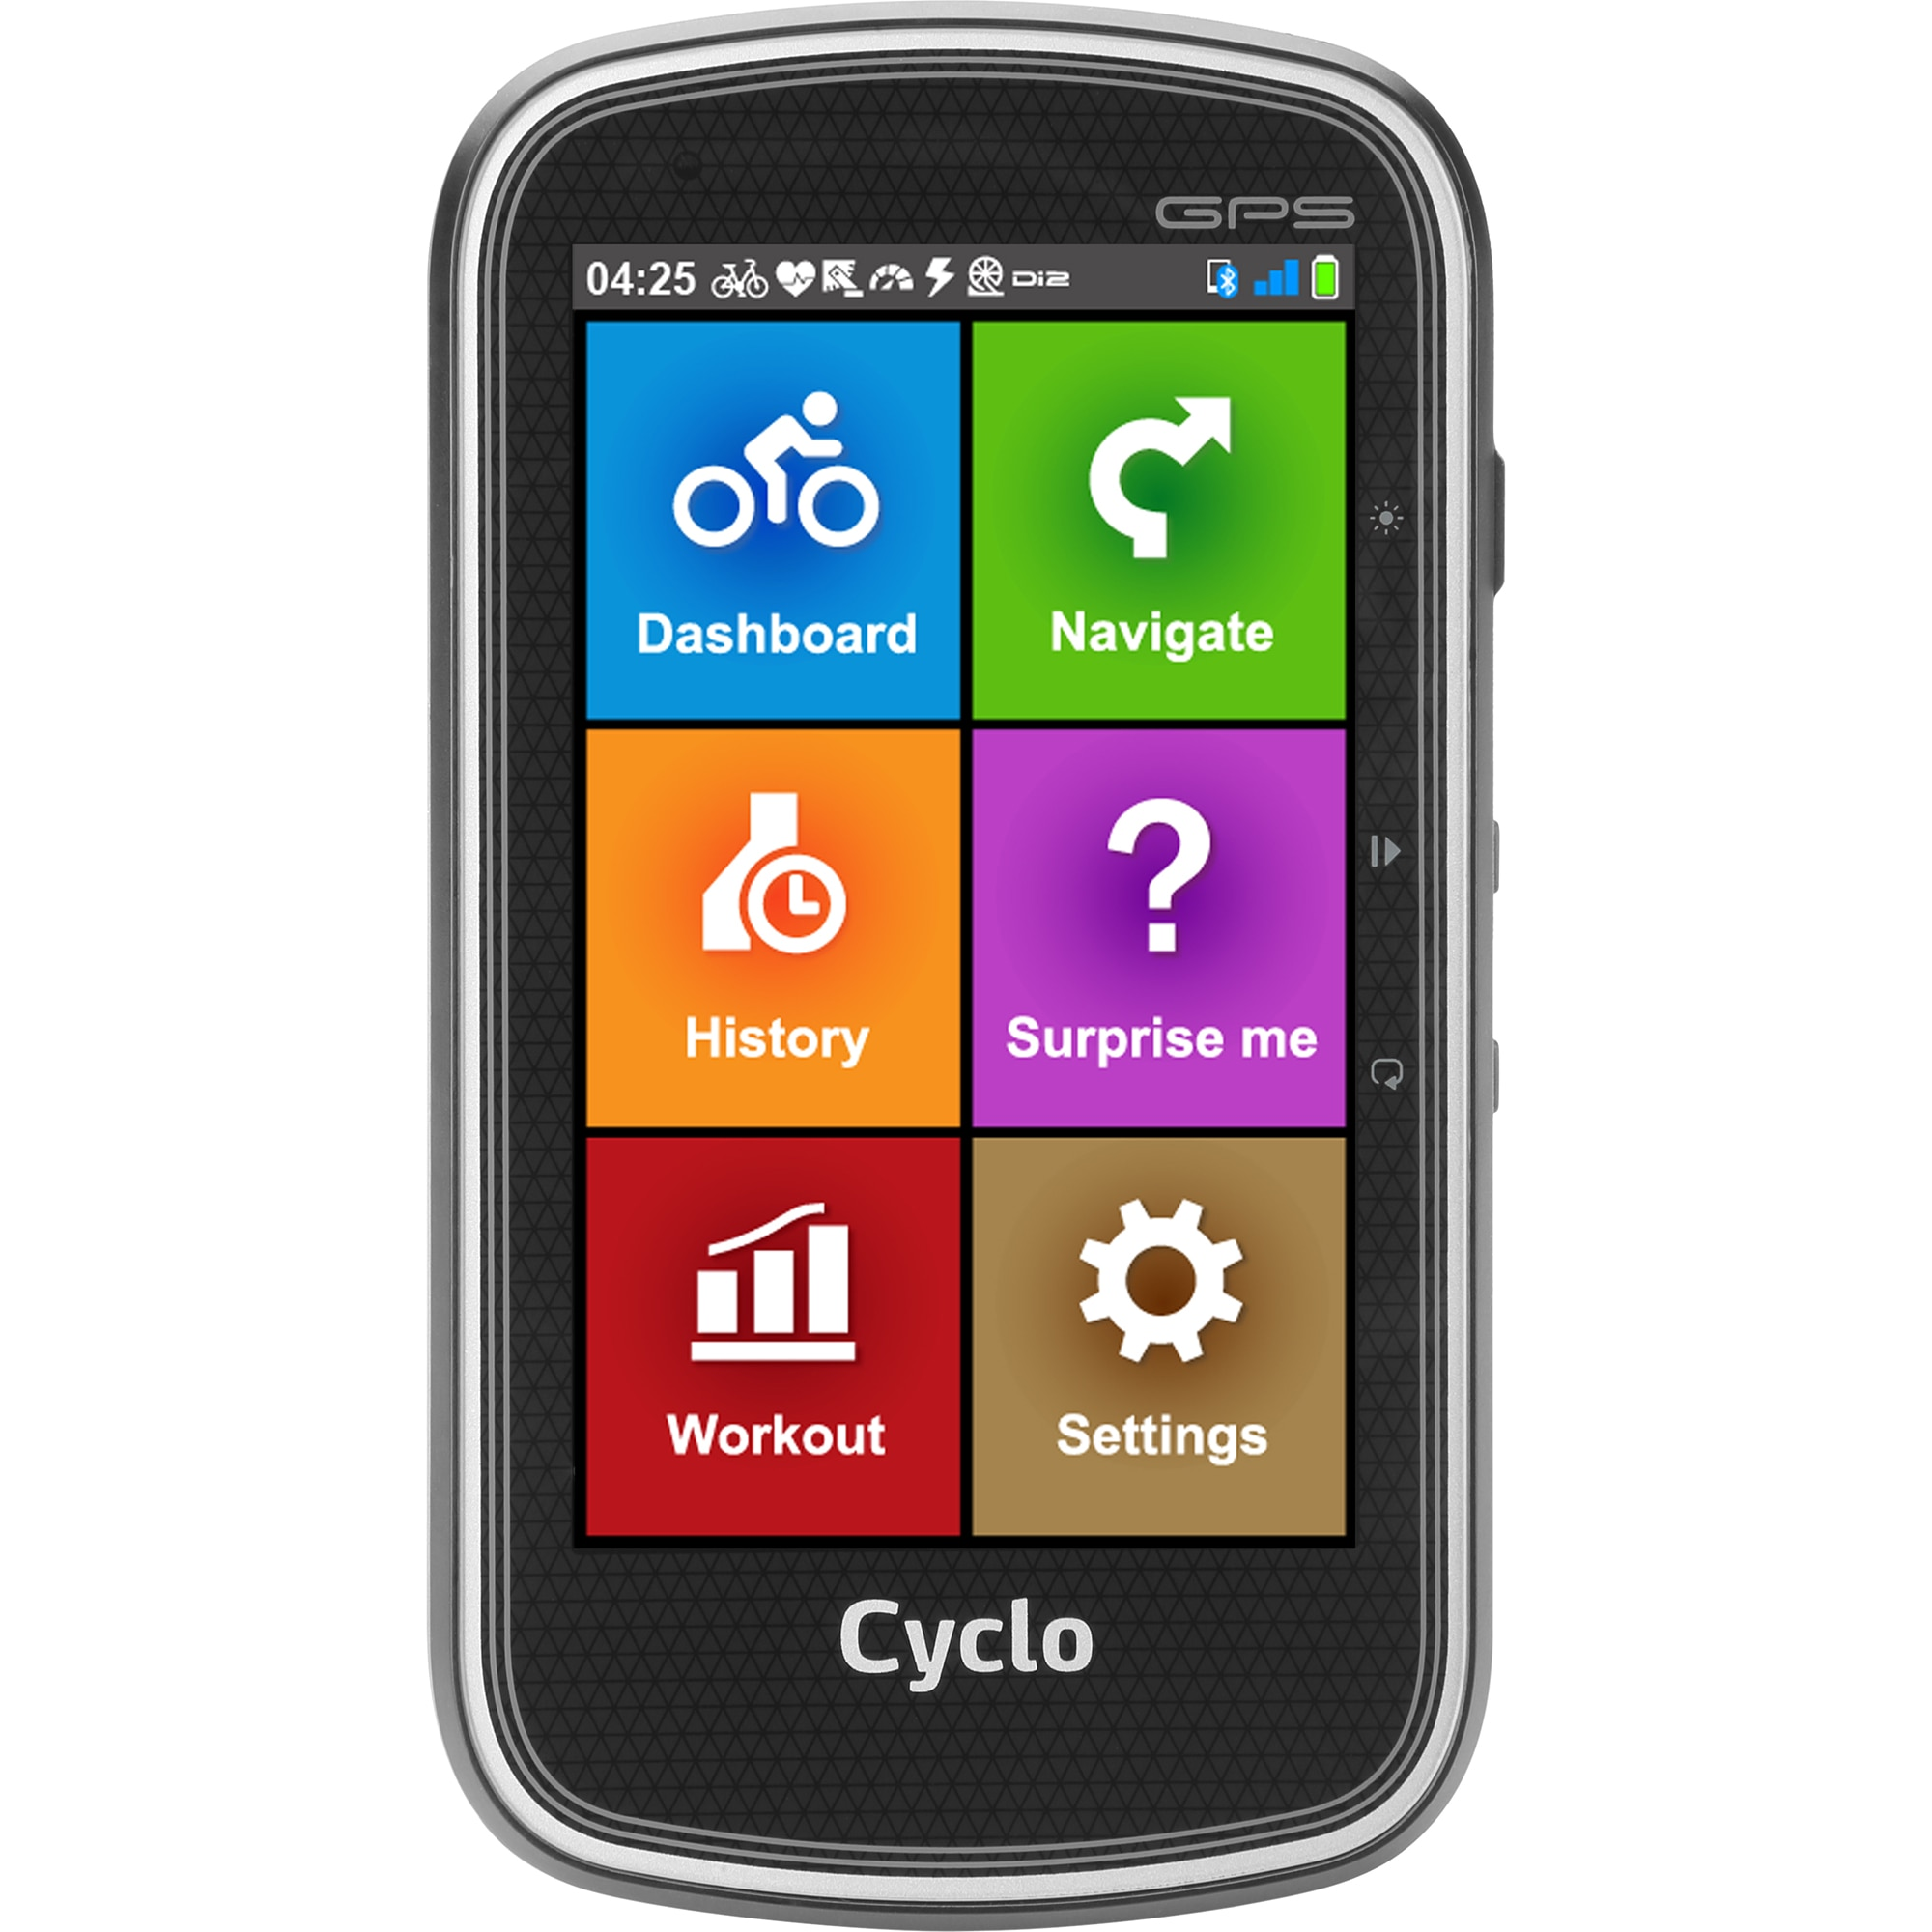 "Fotografie Sistem de navigatie bicicleta Mio MioCyc405HC, ecran tactil antireflex de 4"", bluetooth, compatibil Starva Segments, senzor ANT+ integrat, harti preinstalate FEU"